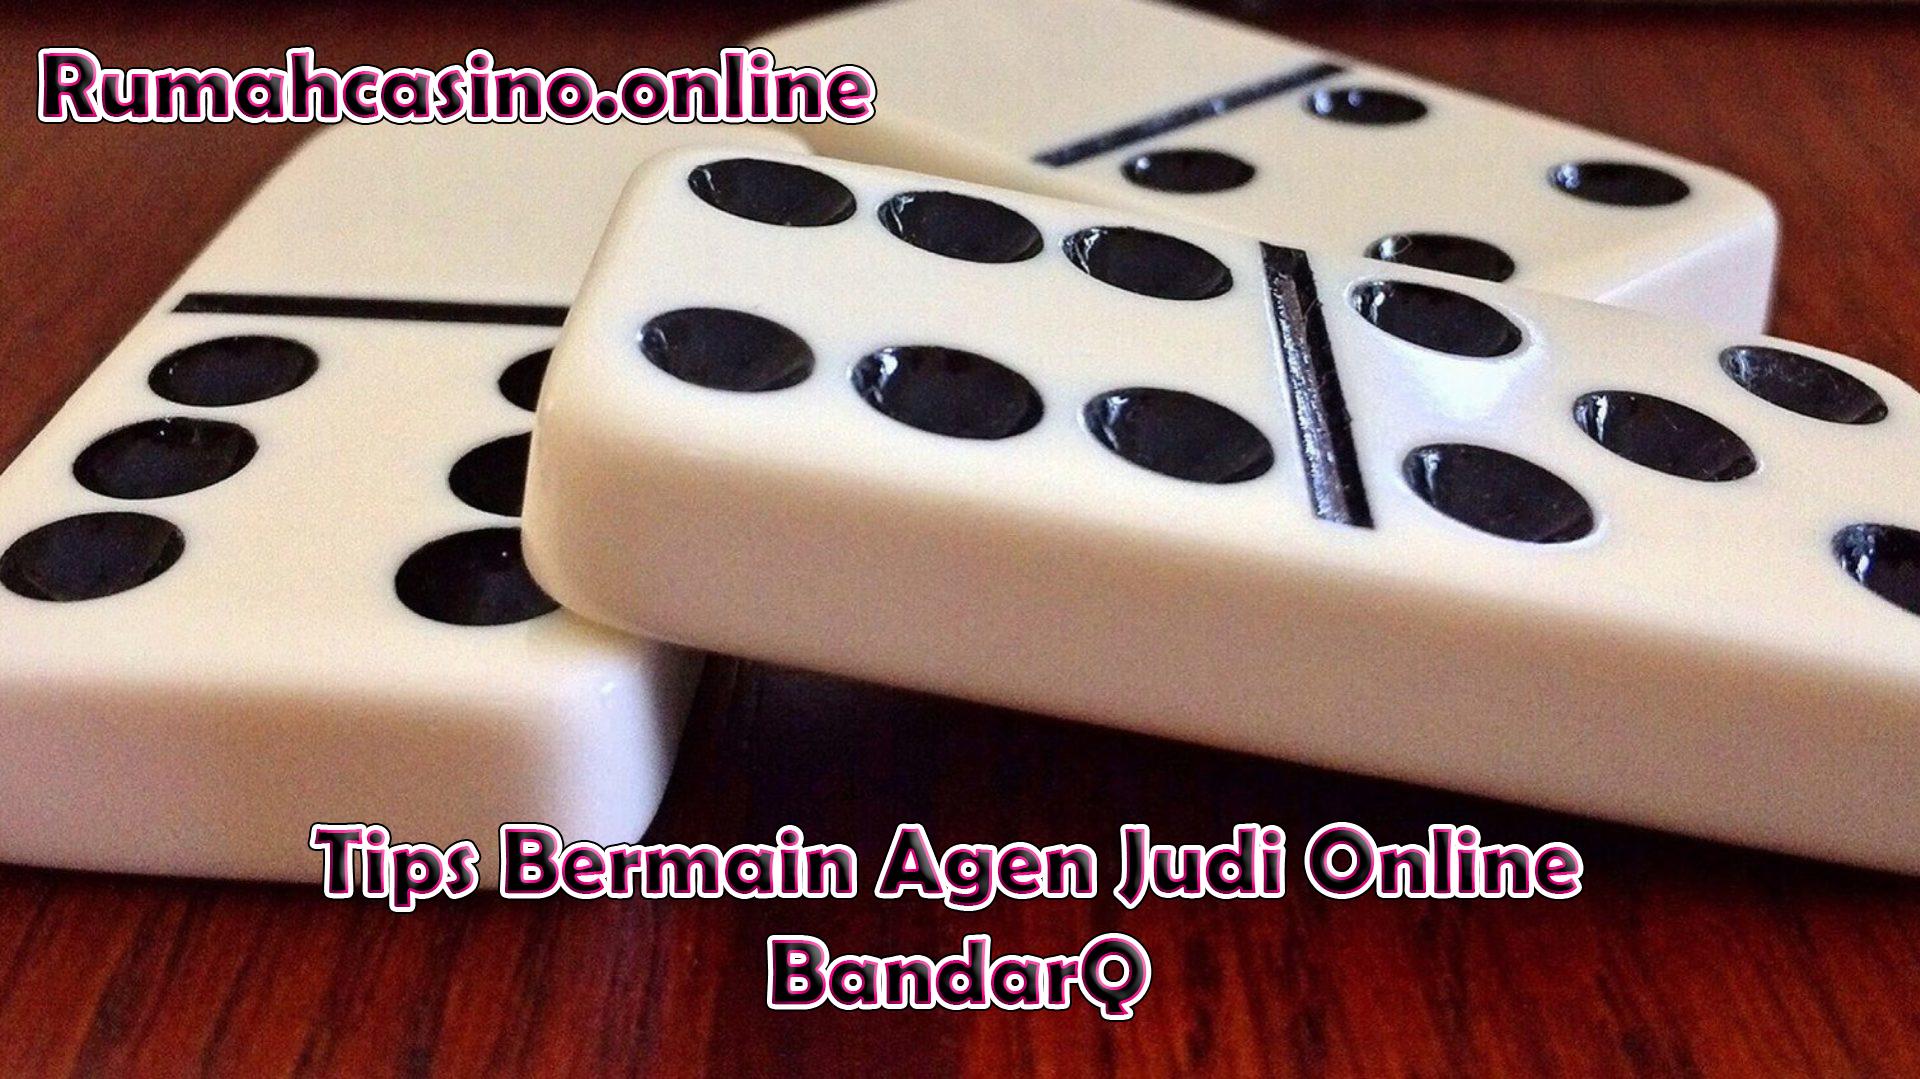 Tips Bermain Agen Judi Online BandarQ